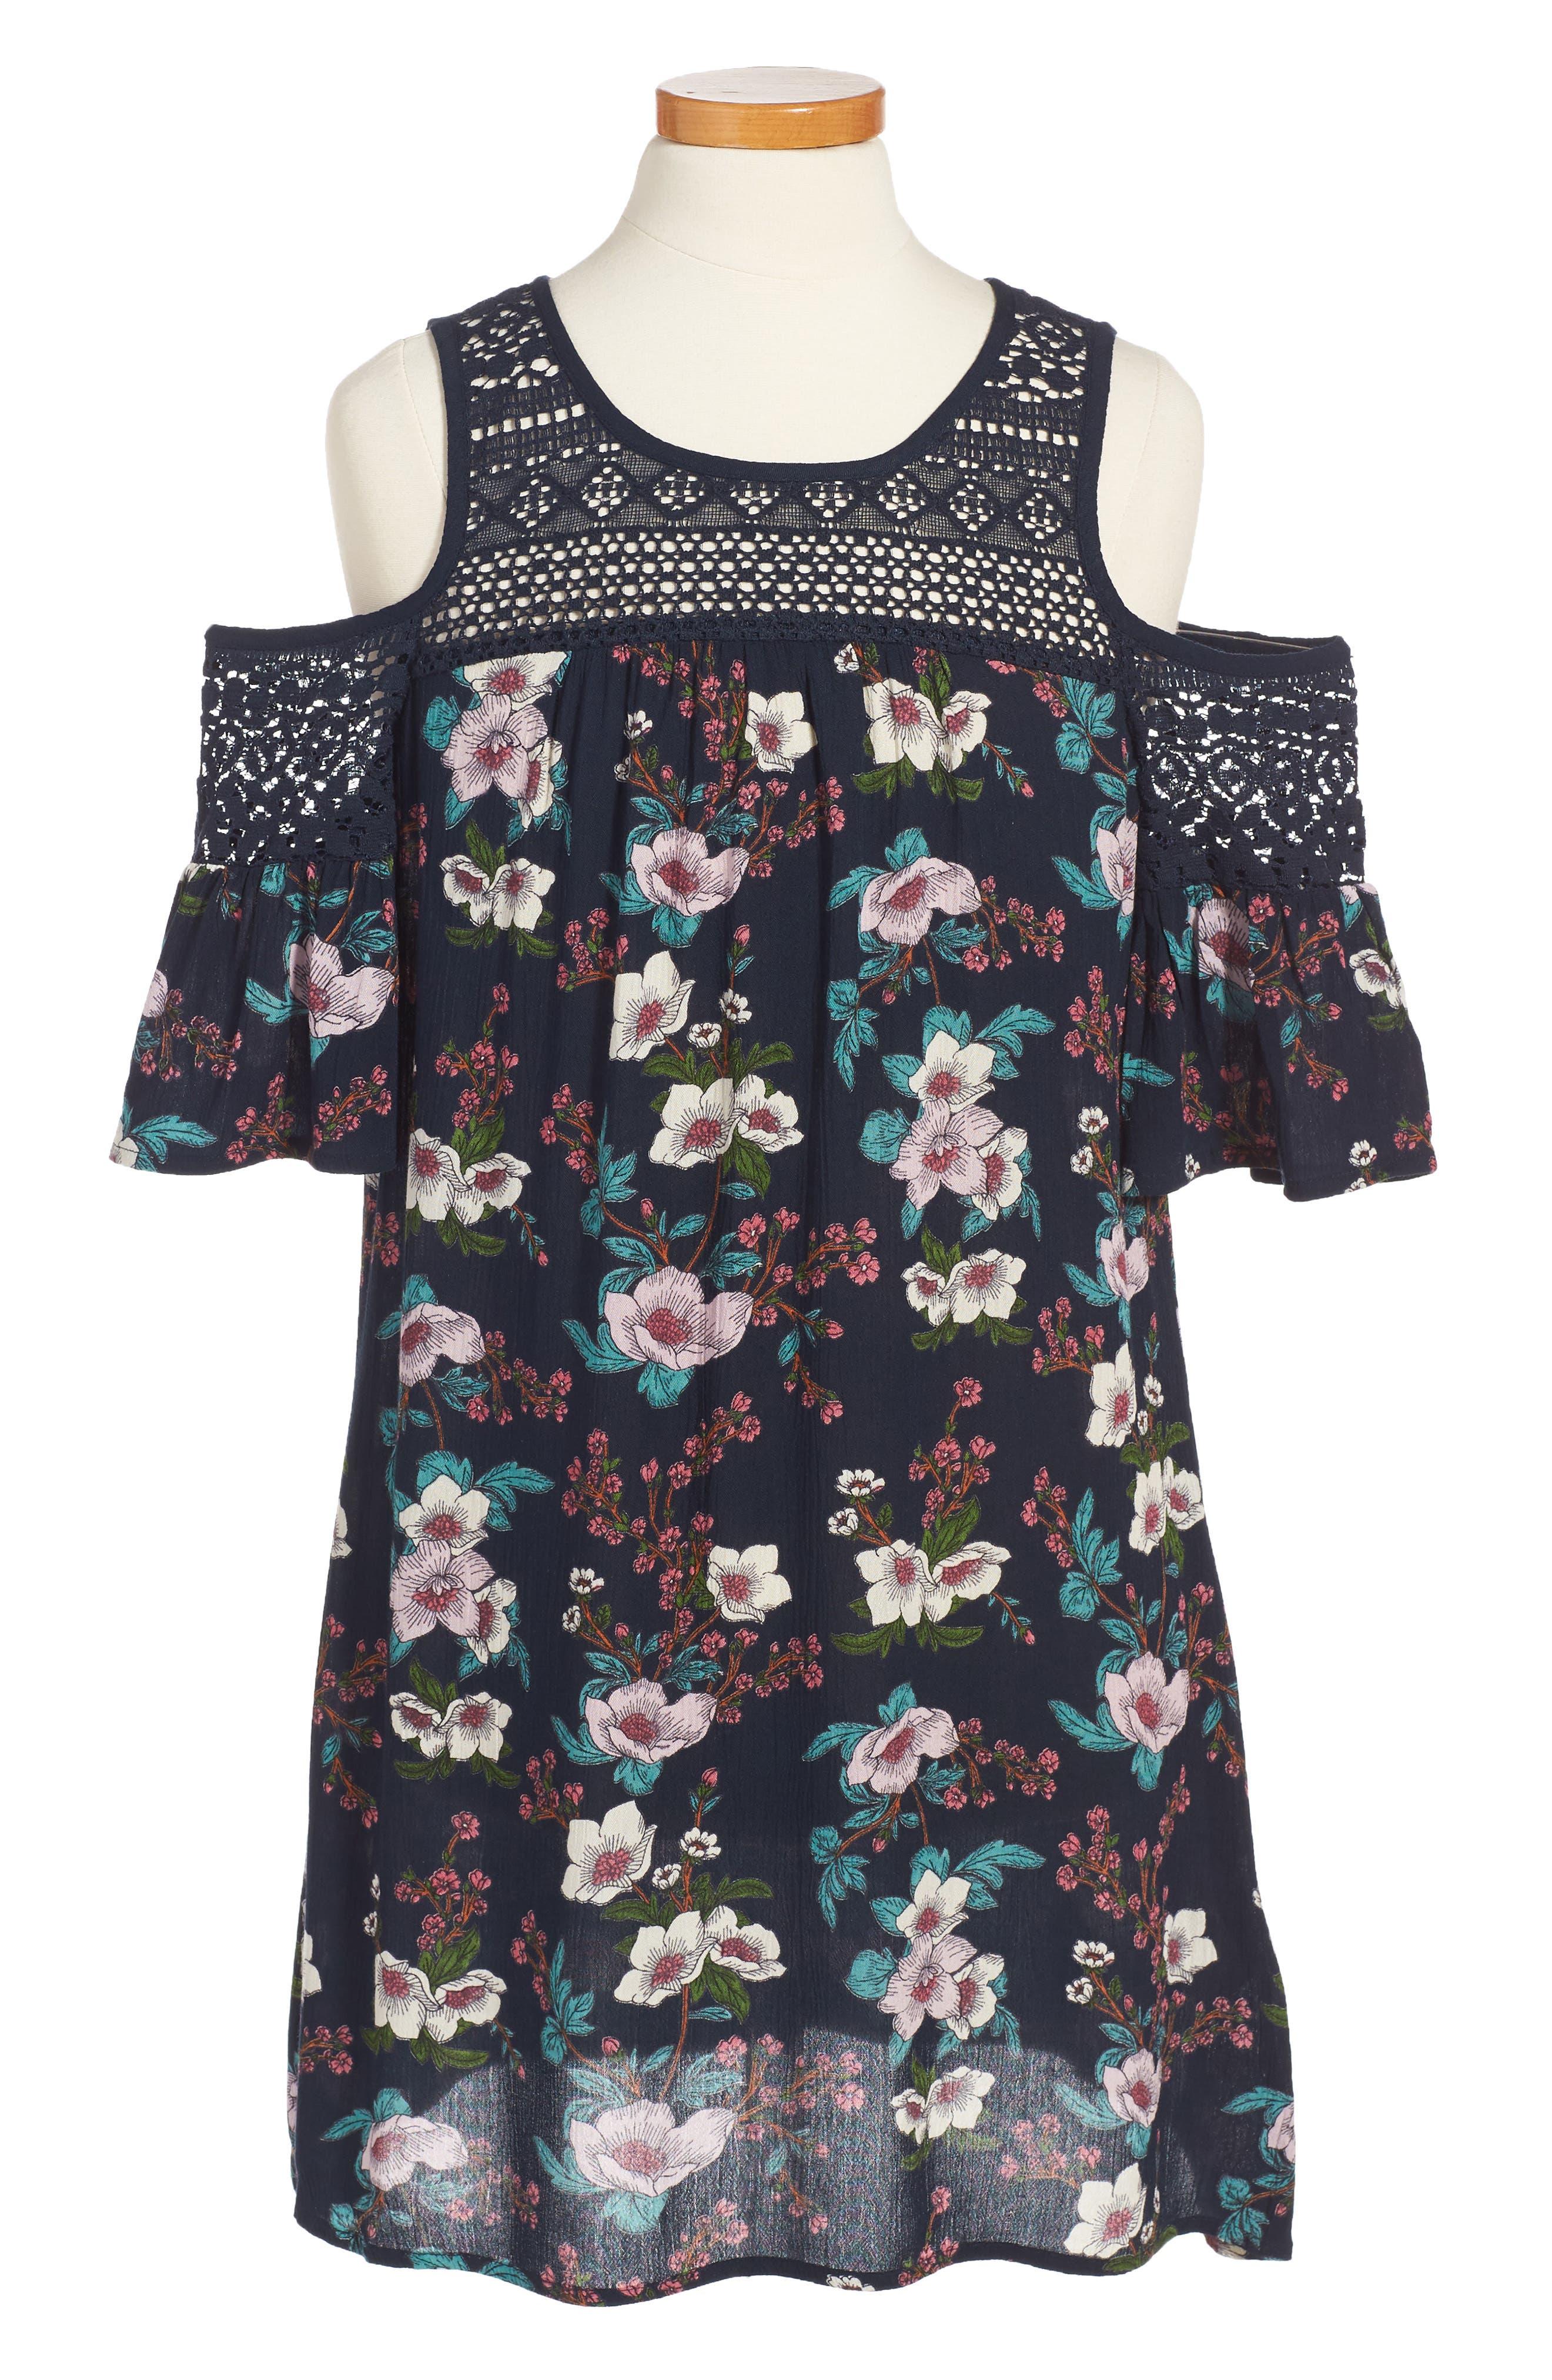 Main Image - Zoe & Rose Crochet Inset Floral Dress (Big Girls)